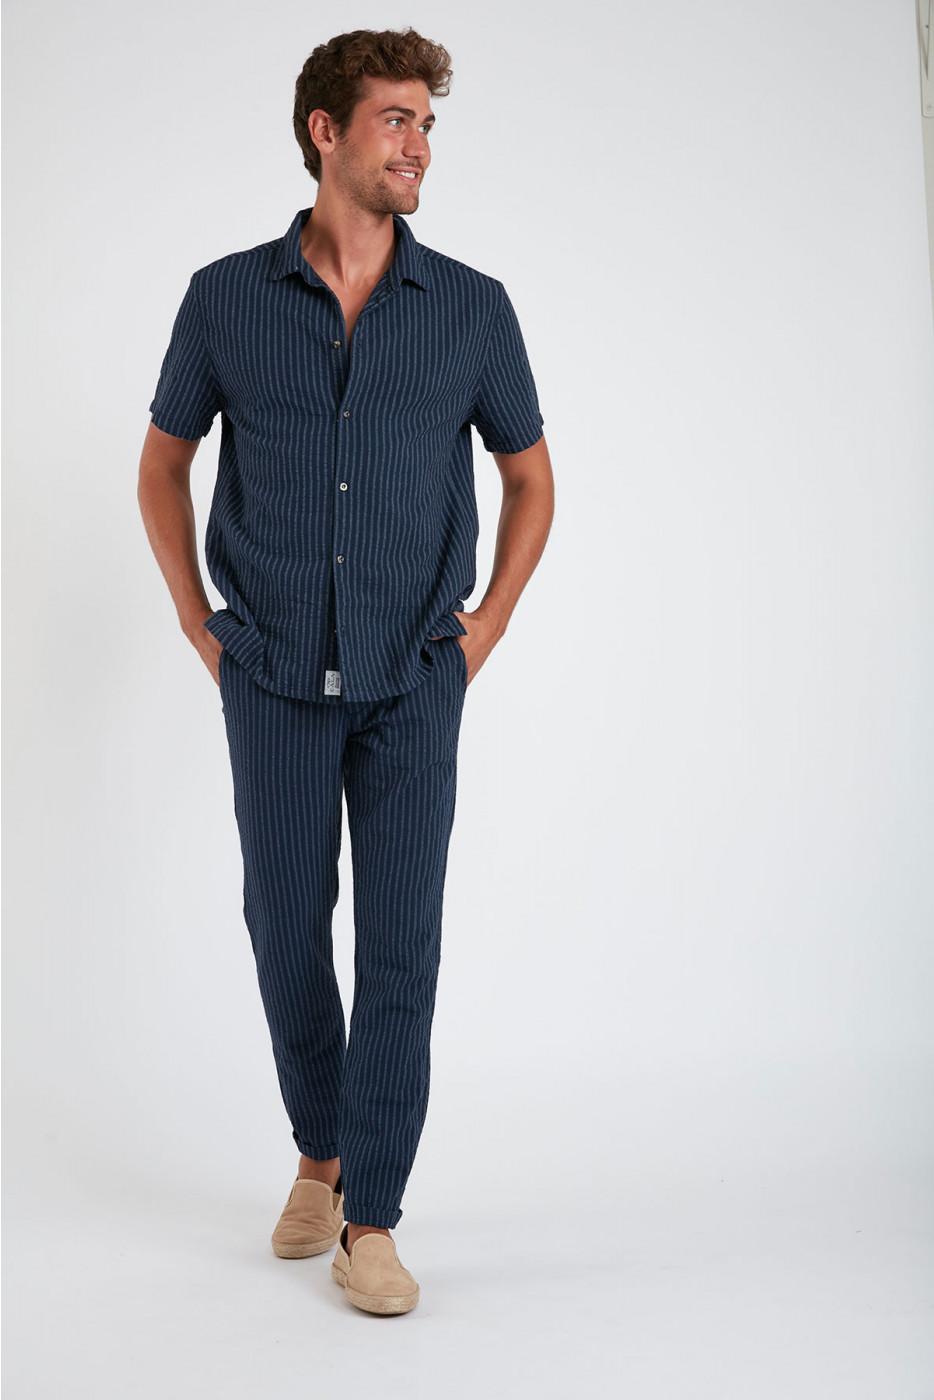 Pantalon à rayures en coton marine - CHINO UNI